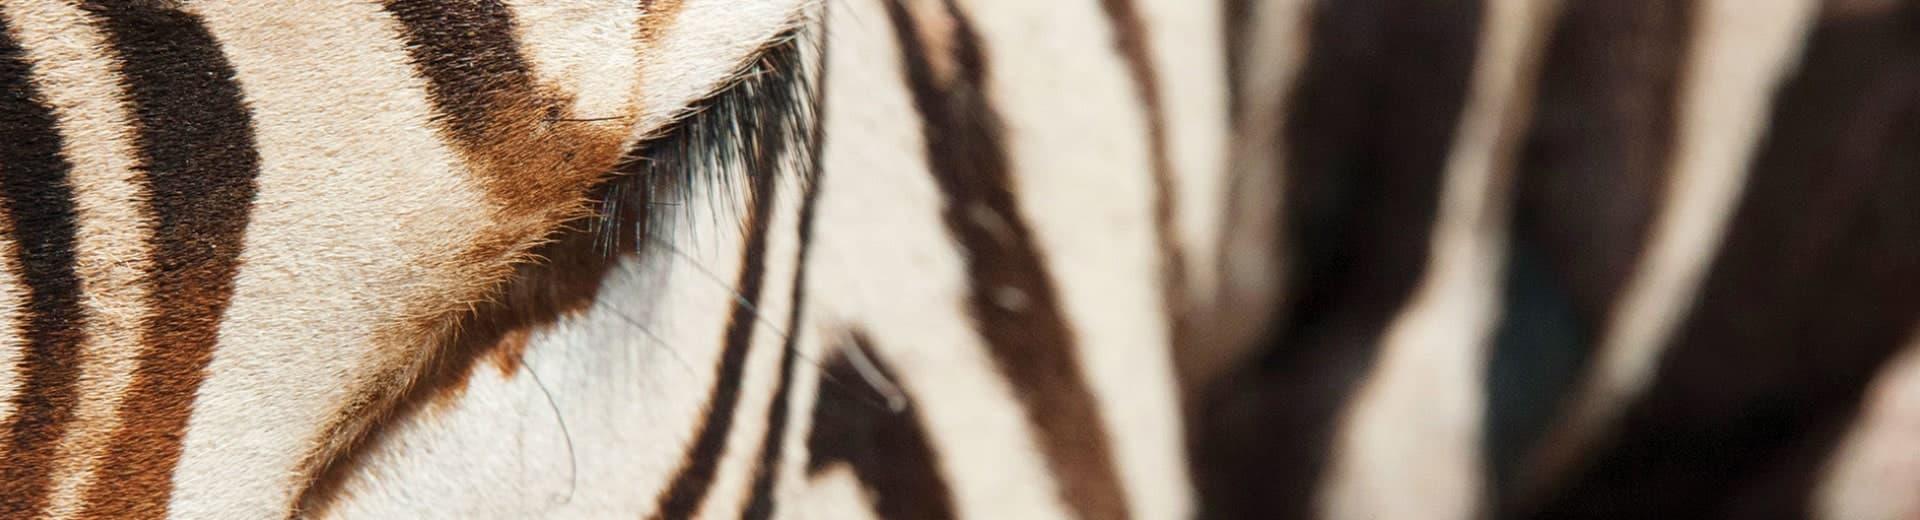 zebra-background